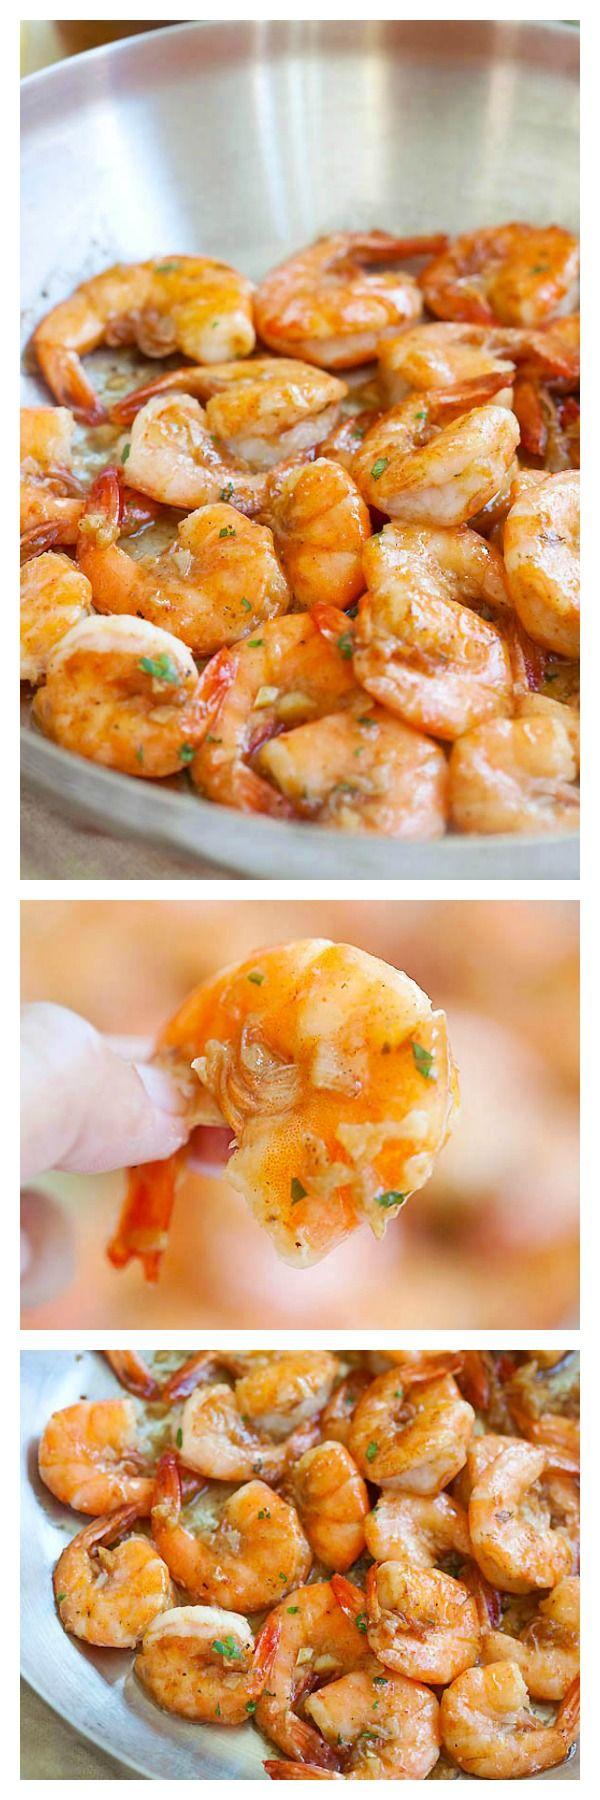 Hawaiian shrimp scampi (garlic butter shrimp) made famous by Giovanni's shrimp truck.